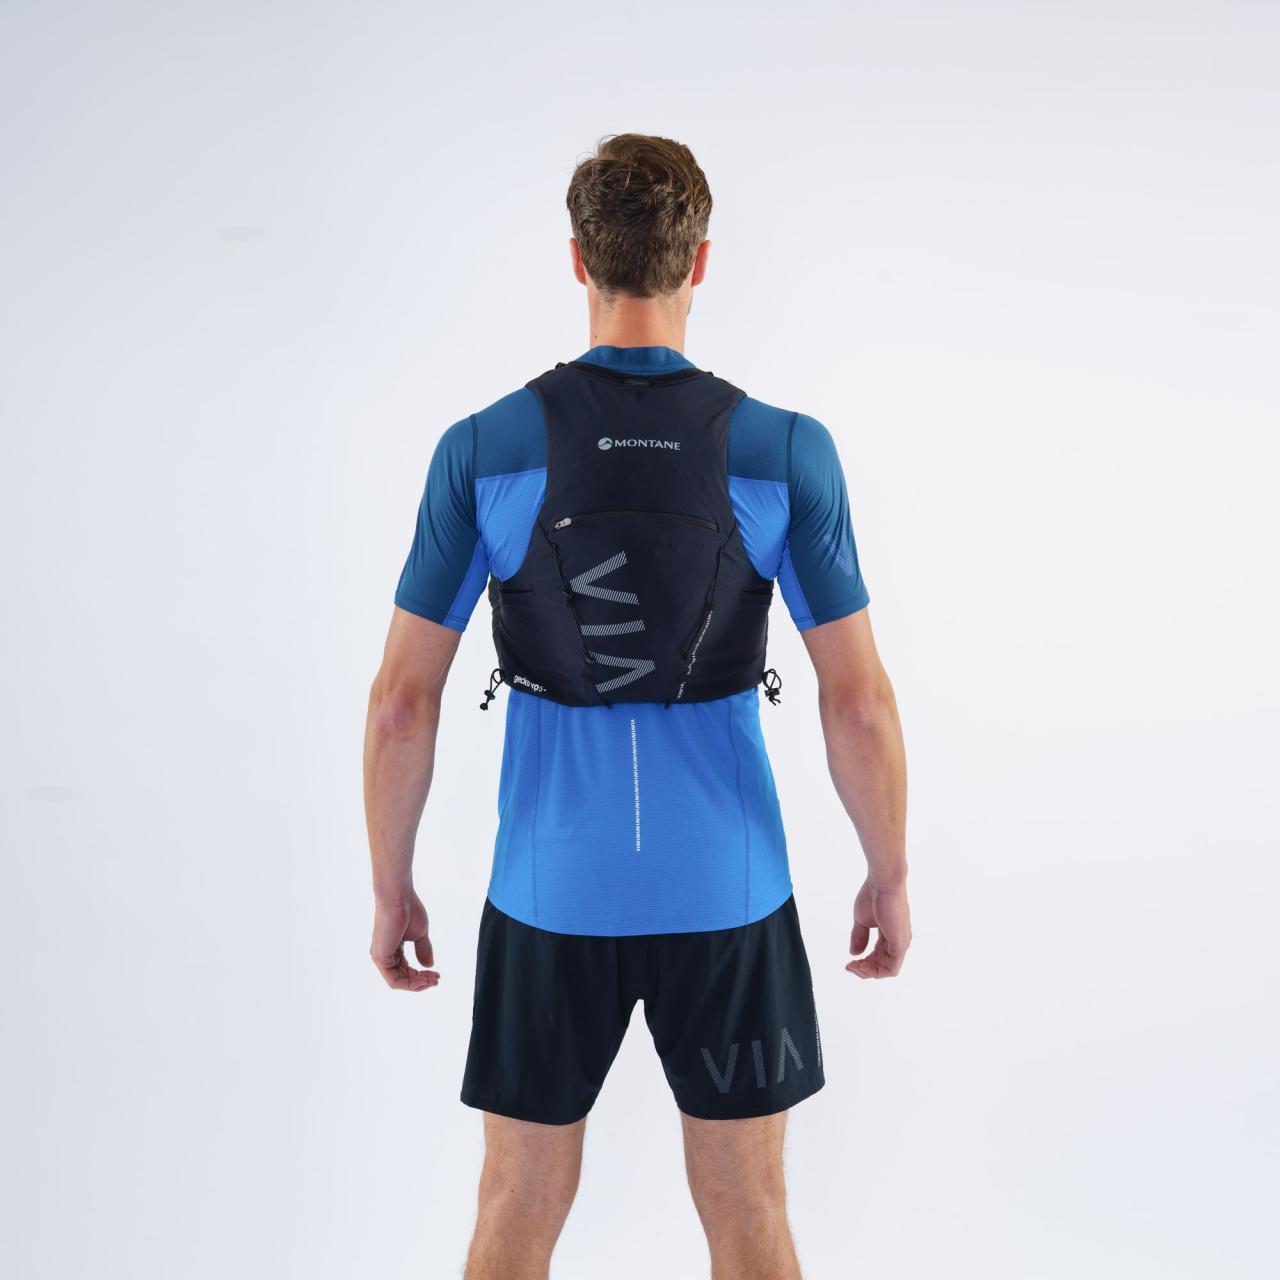 GECKO VP 5+-NARWHAL BLUE-M běžecká vesta modrá